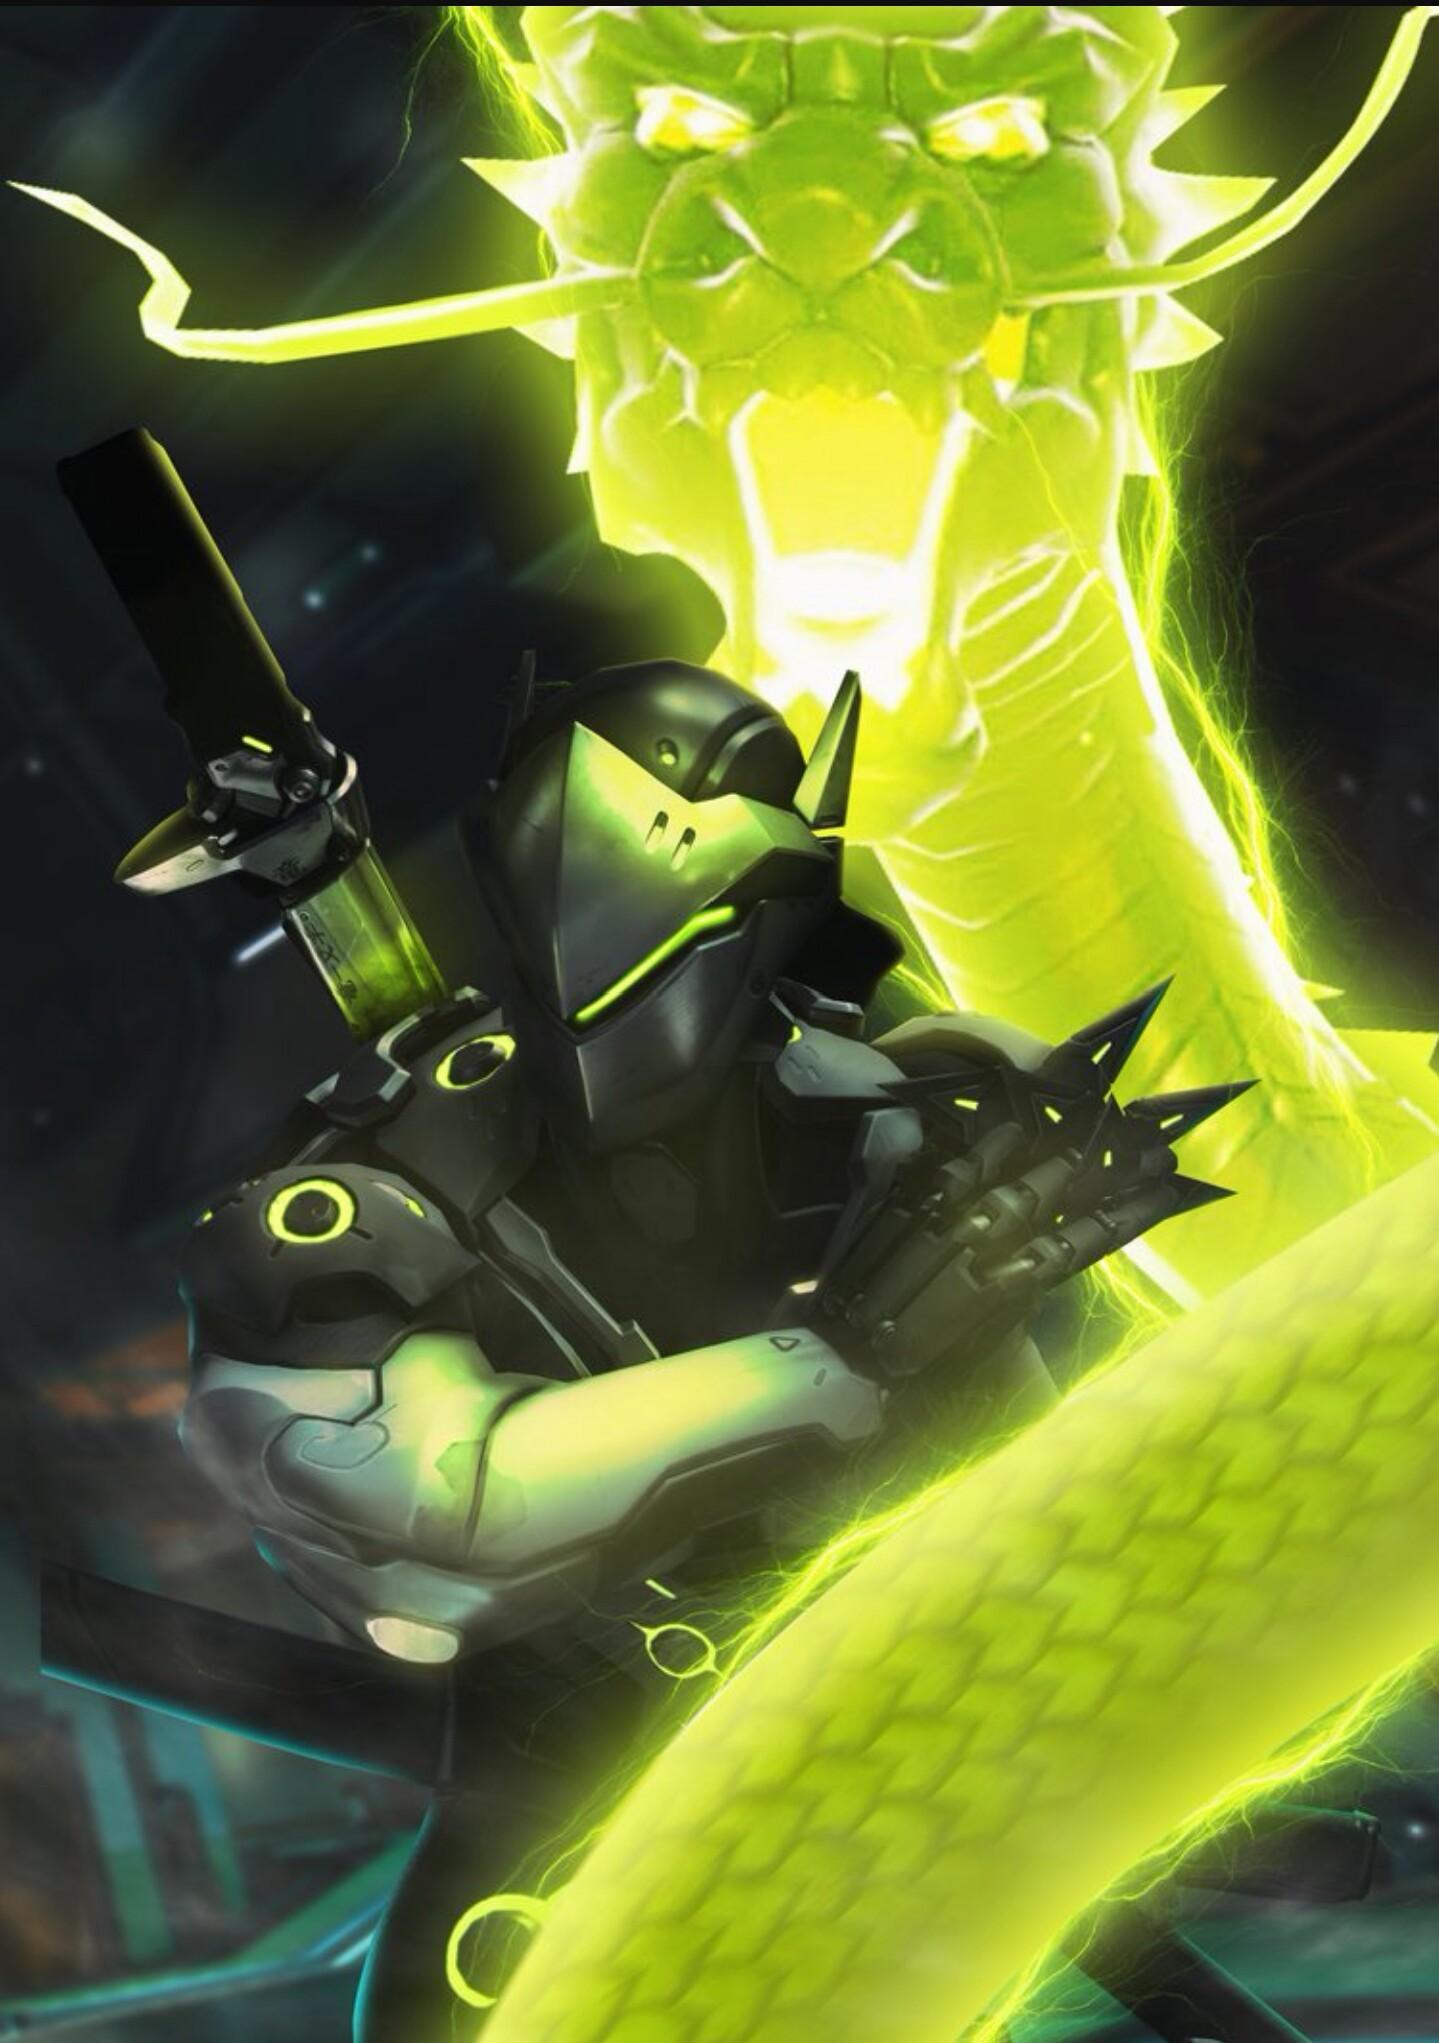 Genji Overwatch Wallpaper 183 ① Download Free Beautiful Full